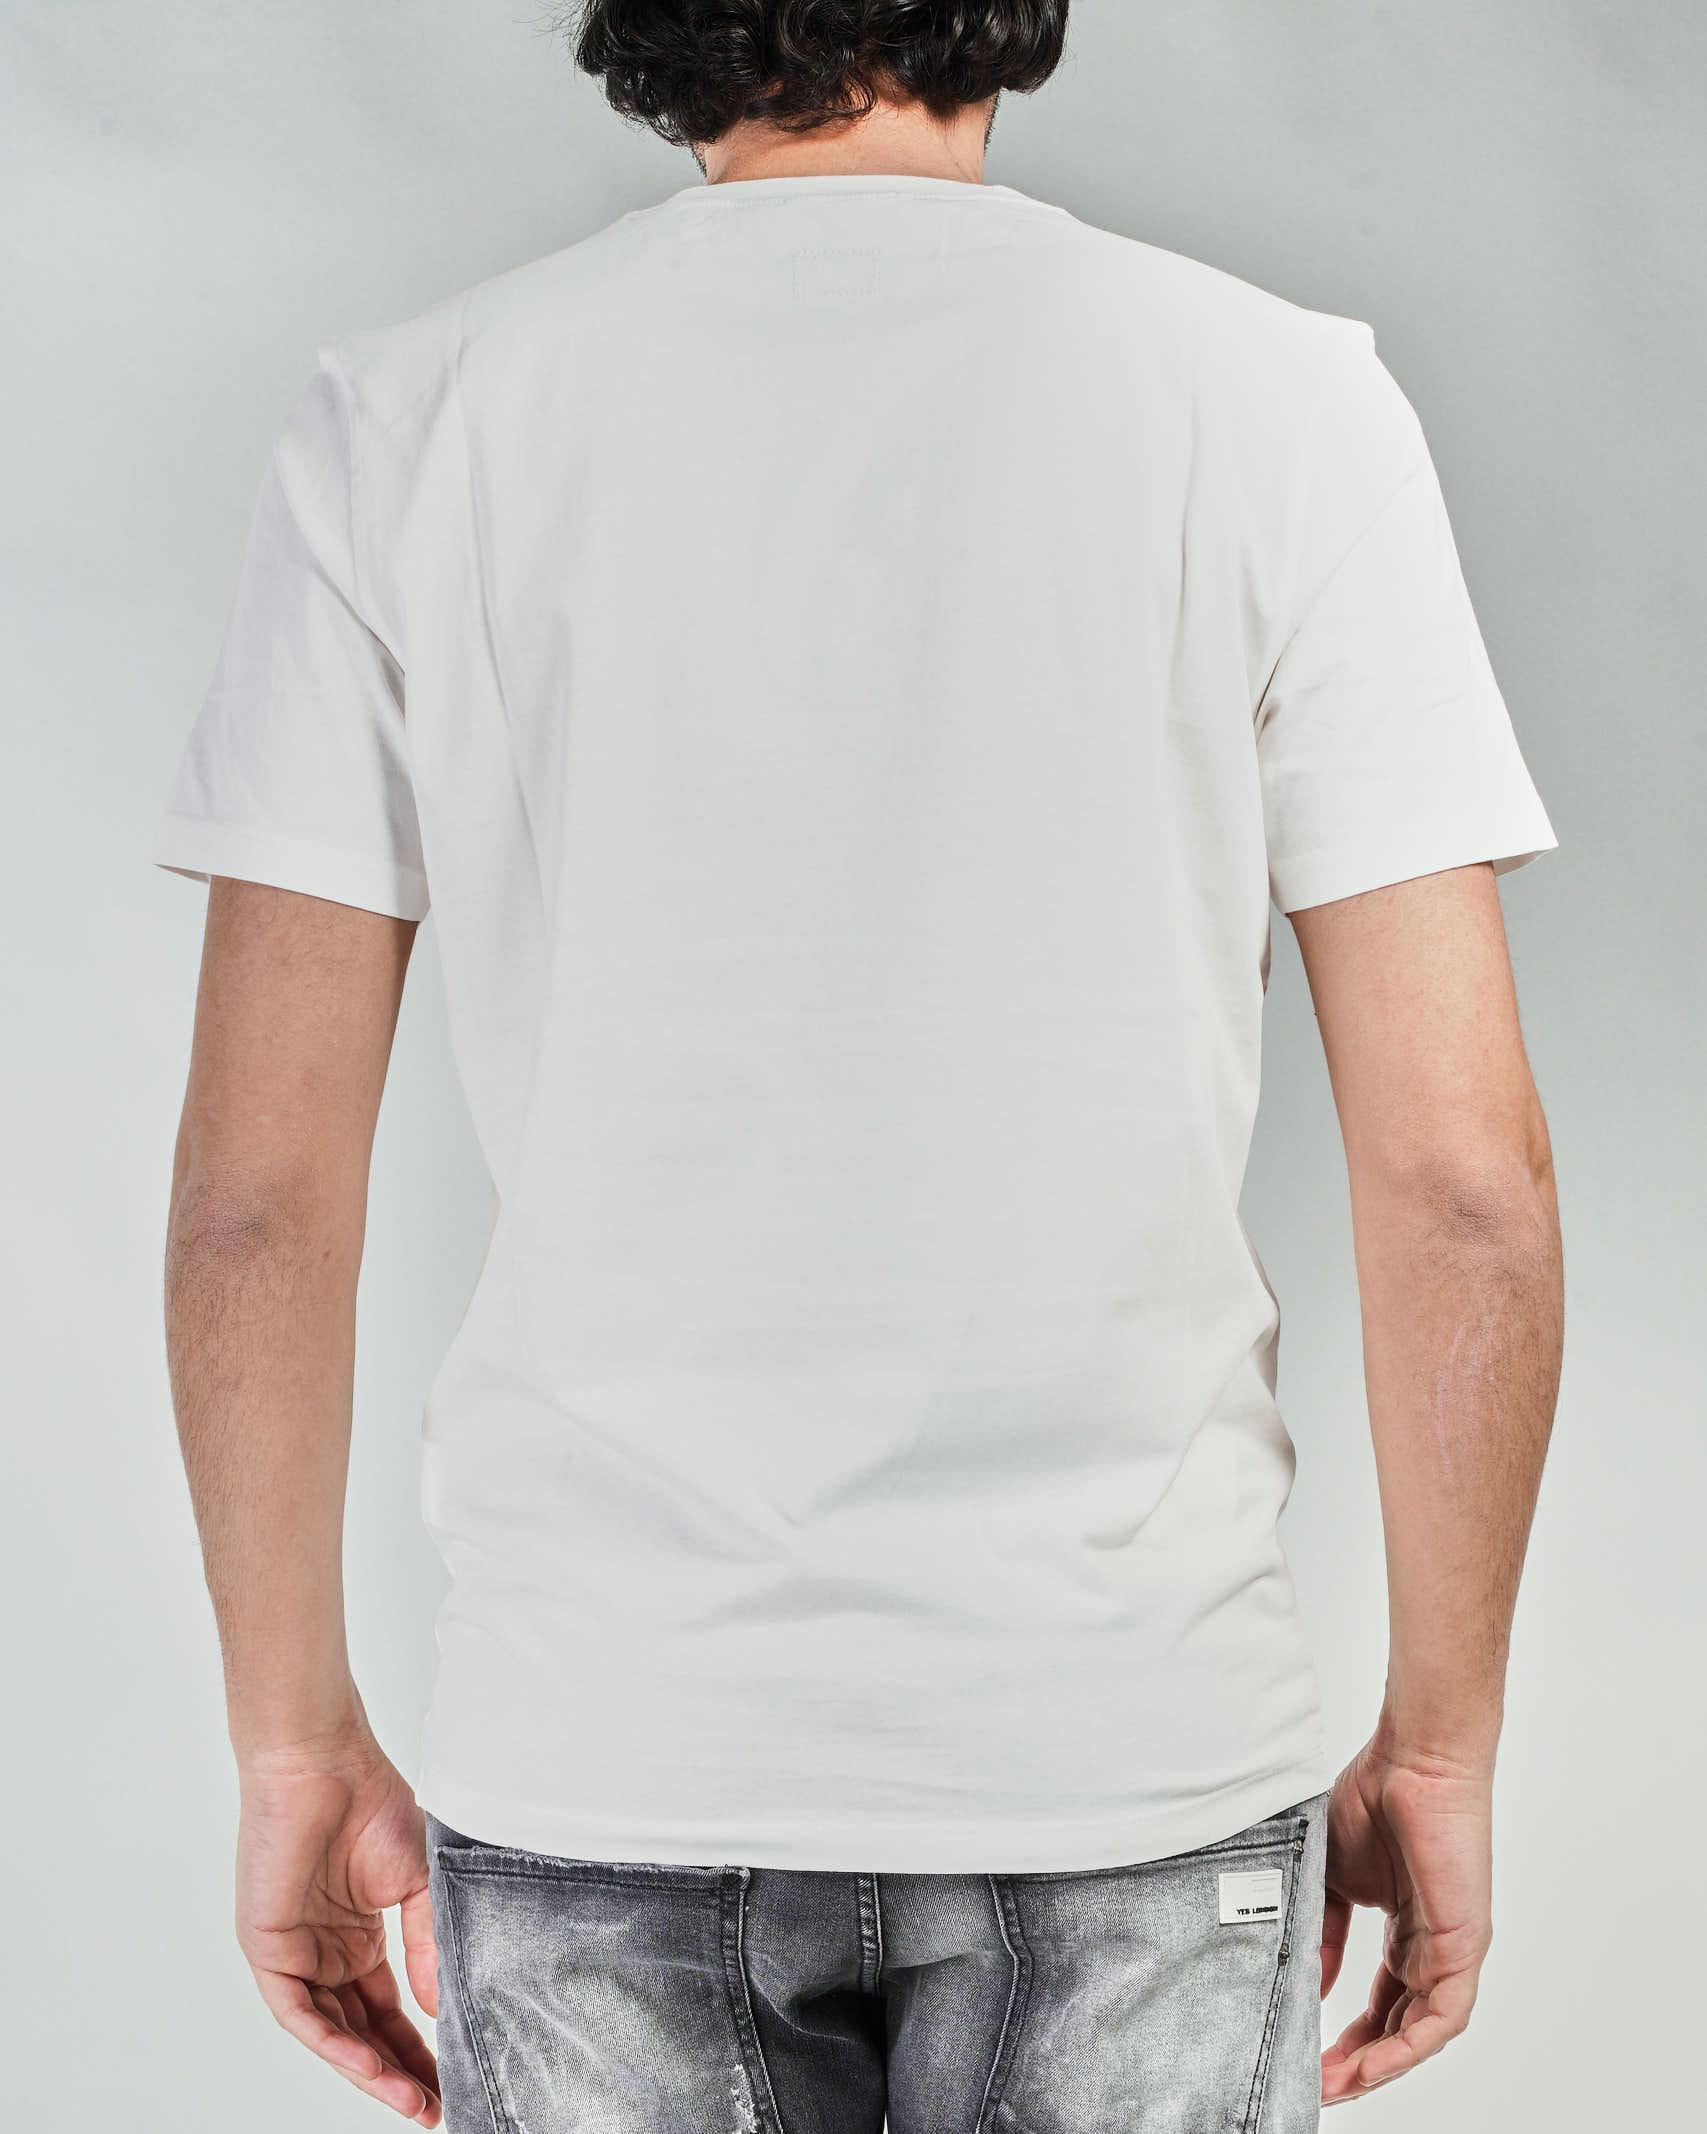 T-shirt Metropolis Series Jersey 30/1 Logo Badge C.P. Company C.P. COMPANY | T-shirt | 10CMTS065A005100W103